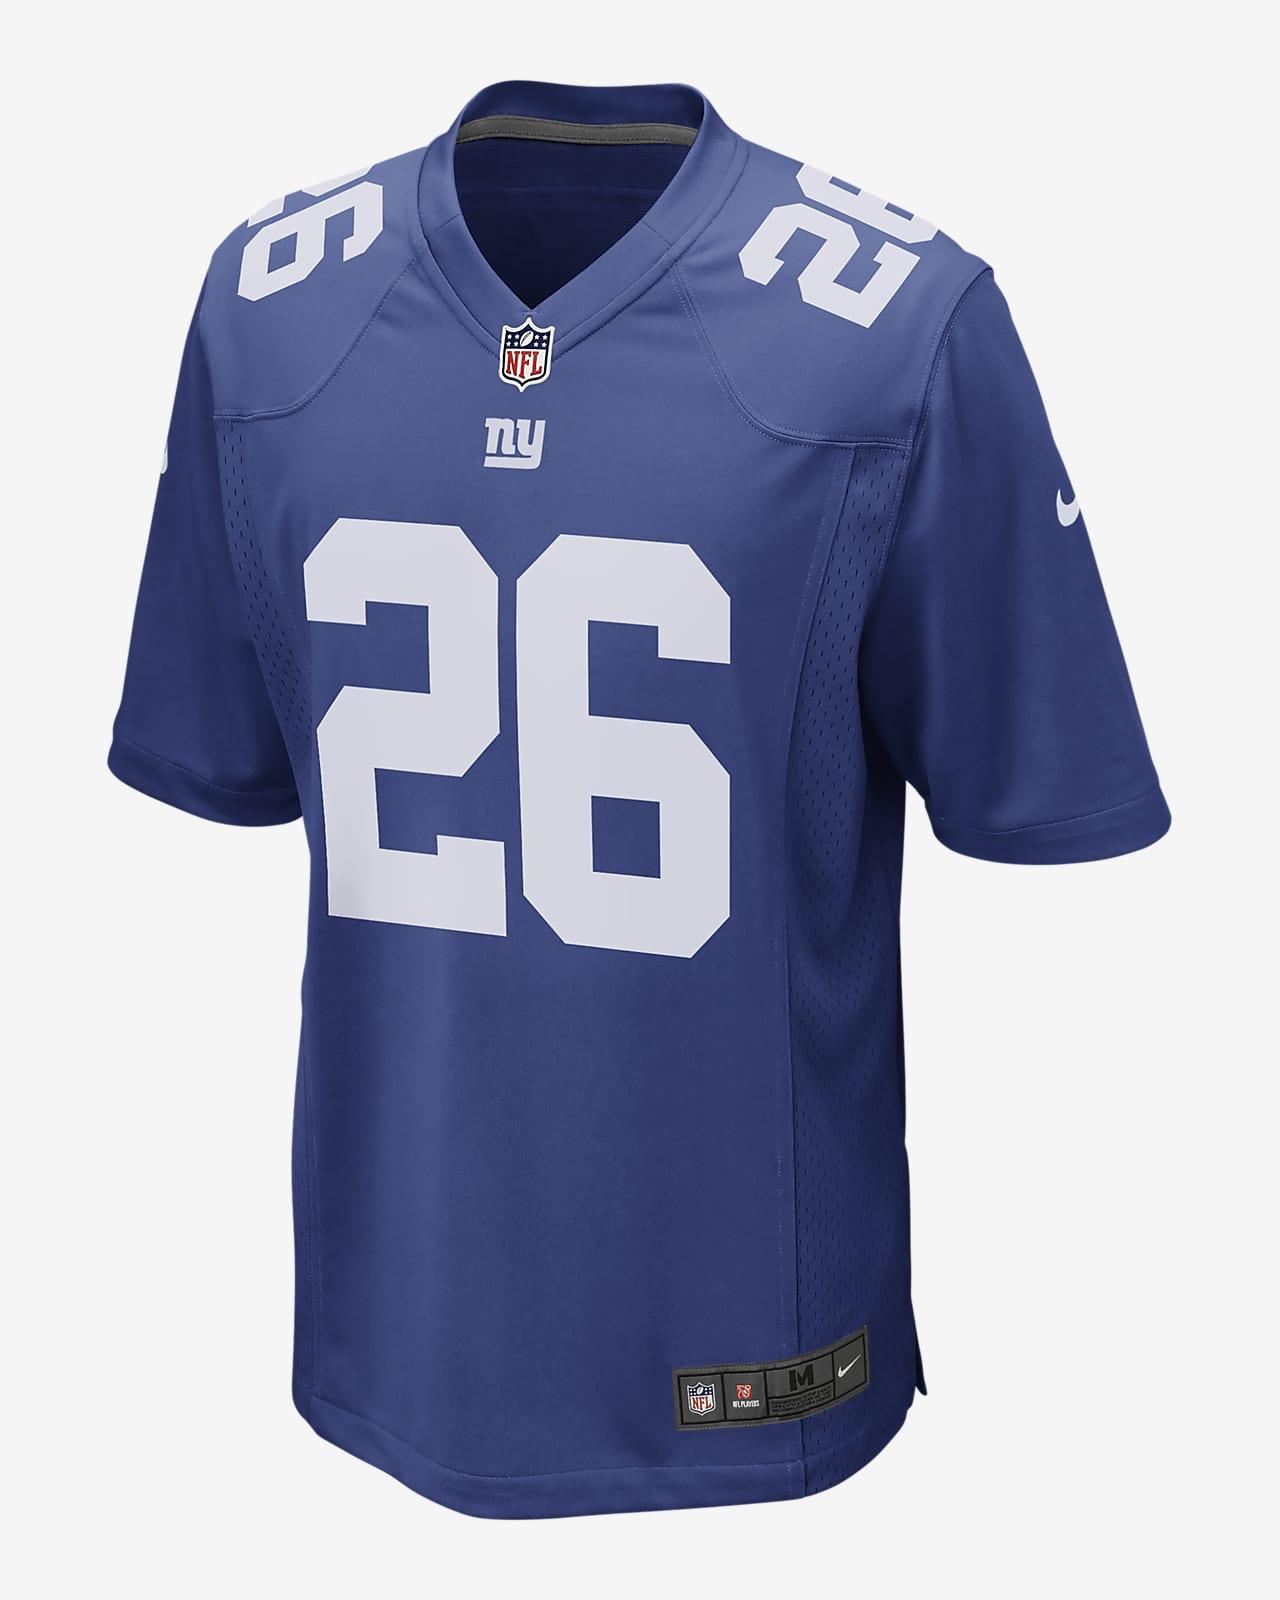 NFL New York Giants (Saquon Barkley) Men's Game Football Jersey